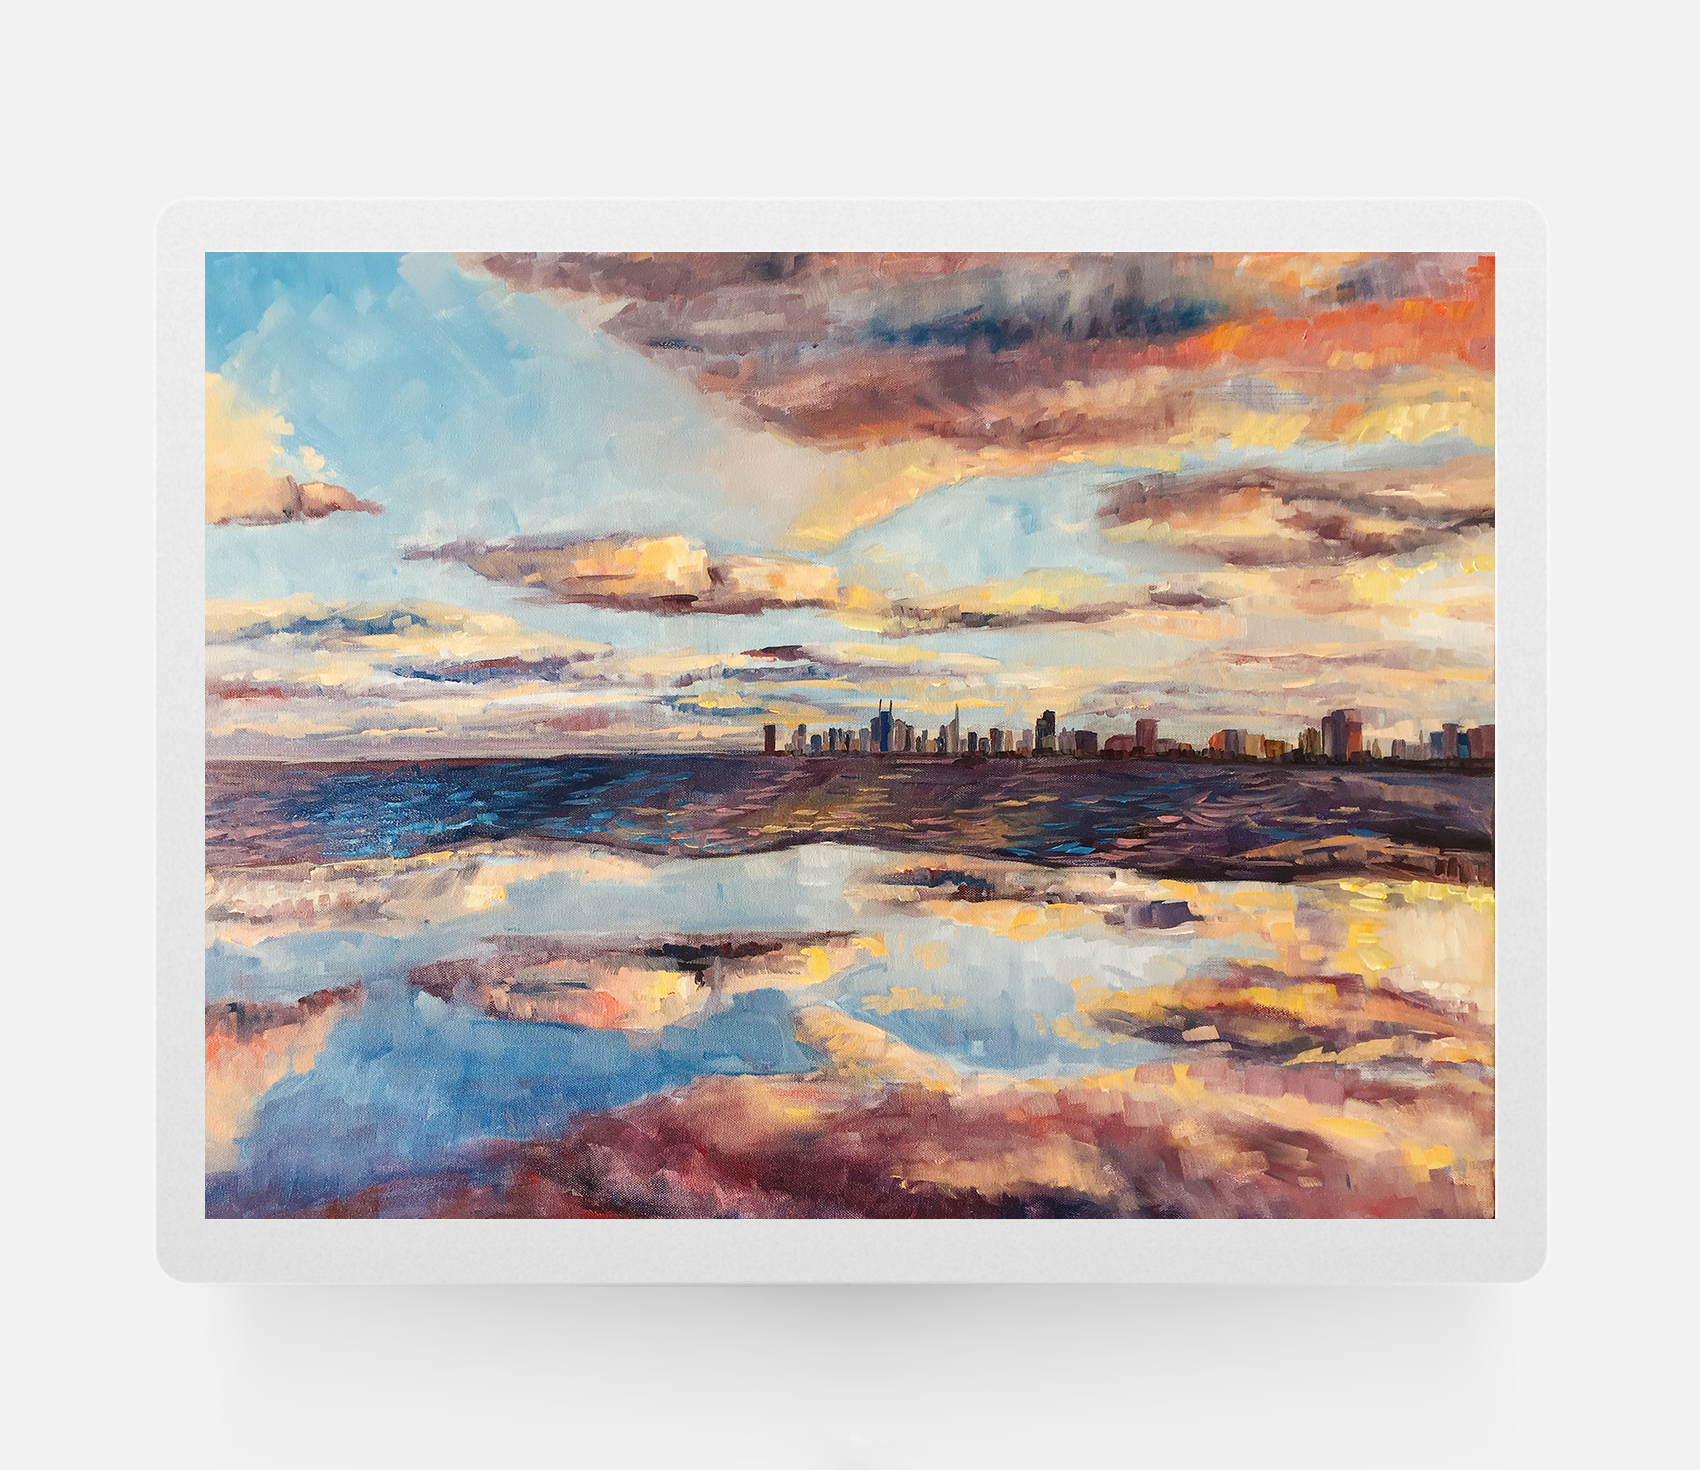 Ice, Sky and City